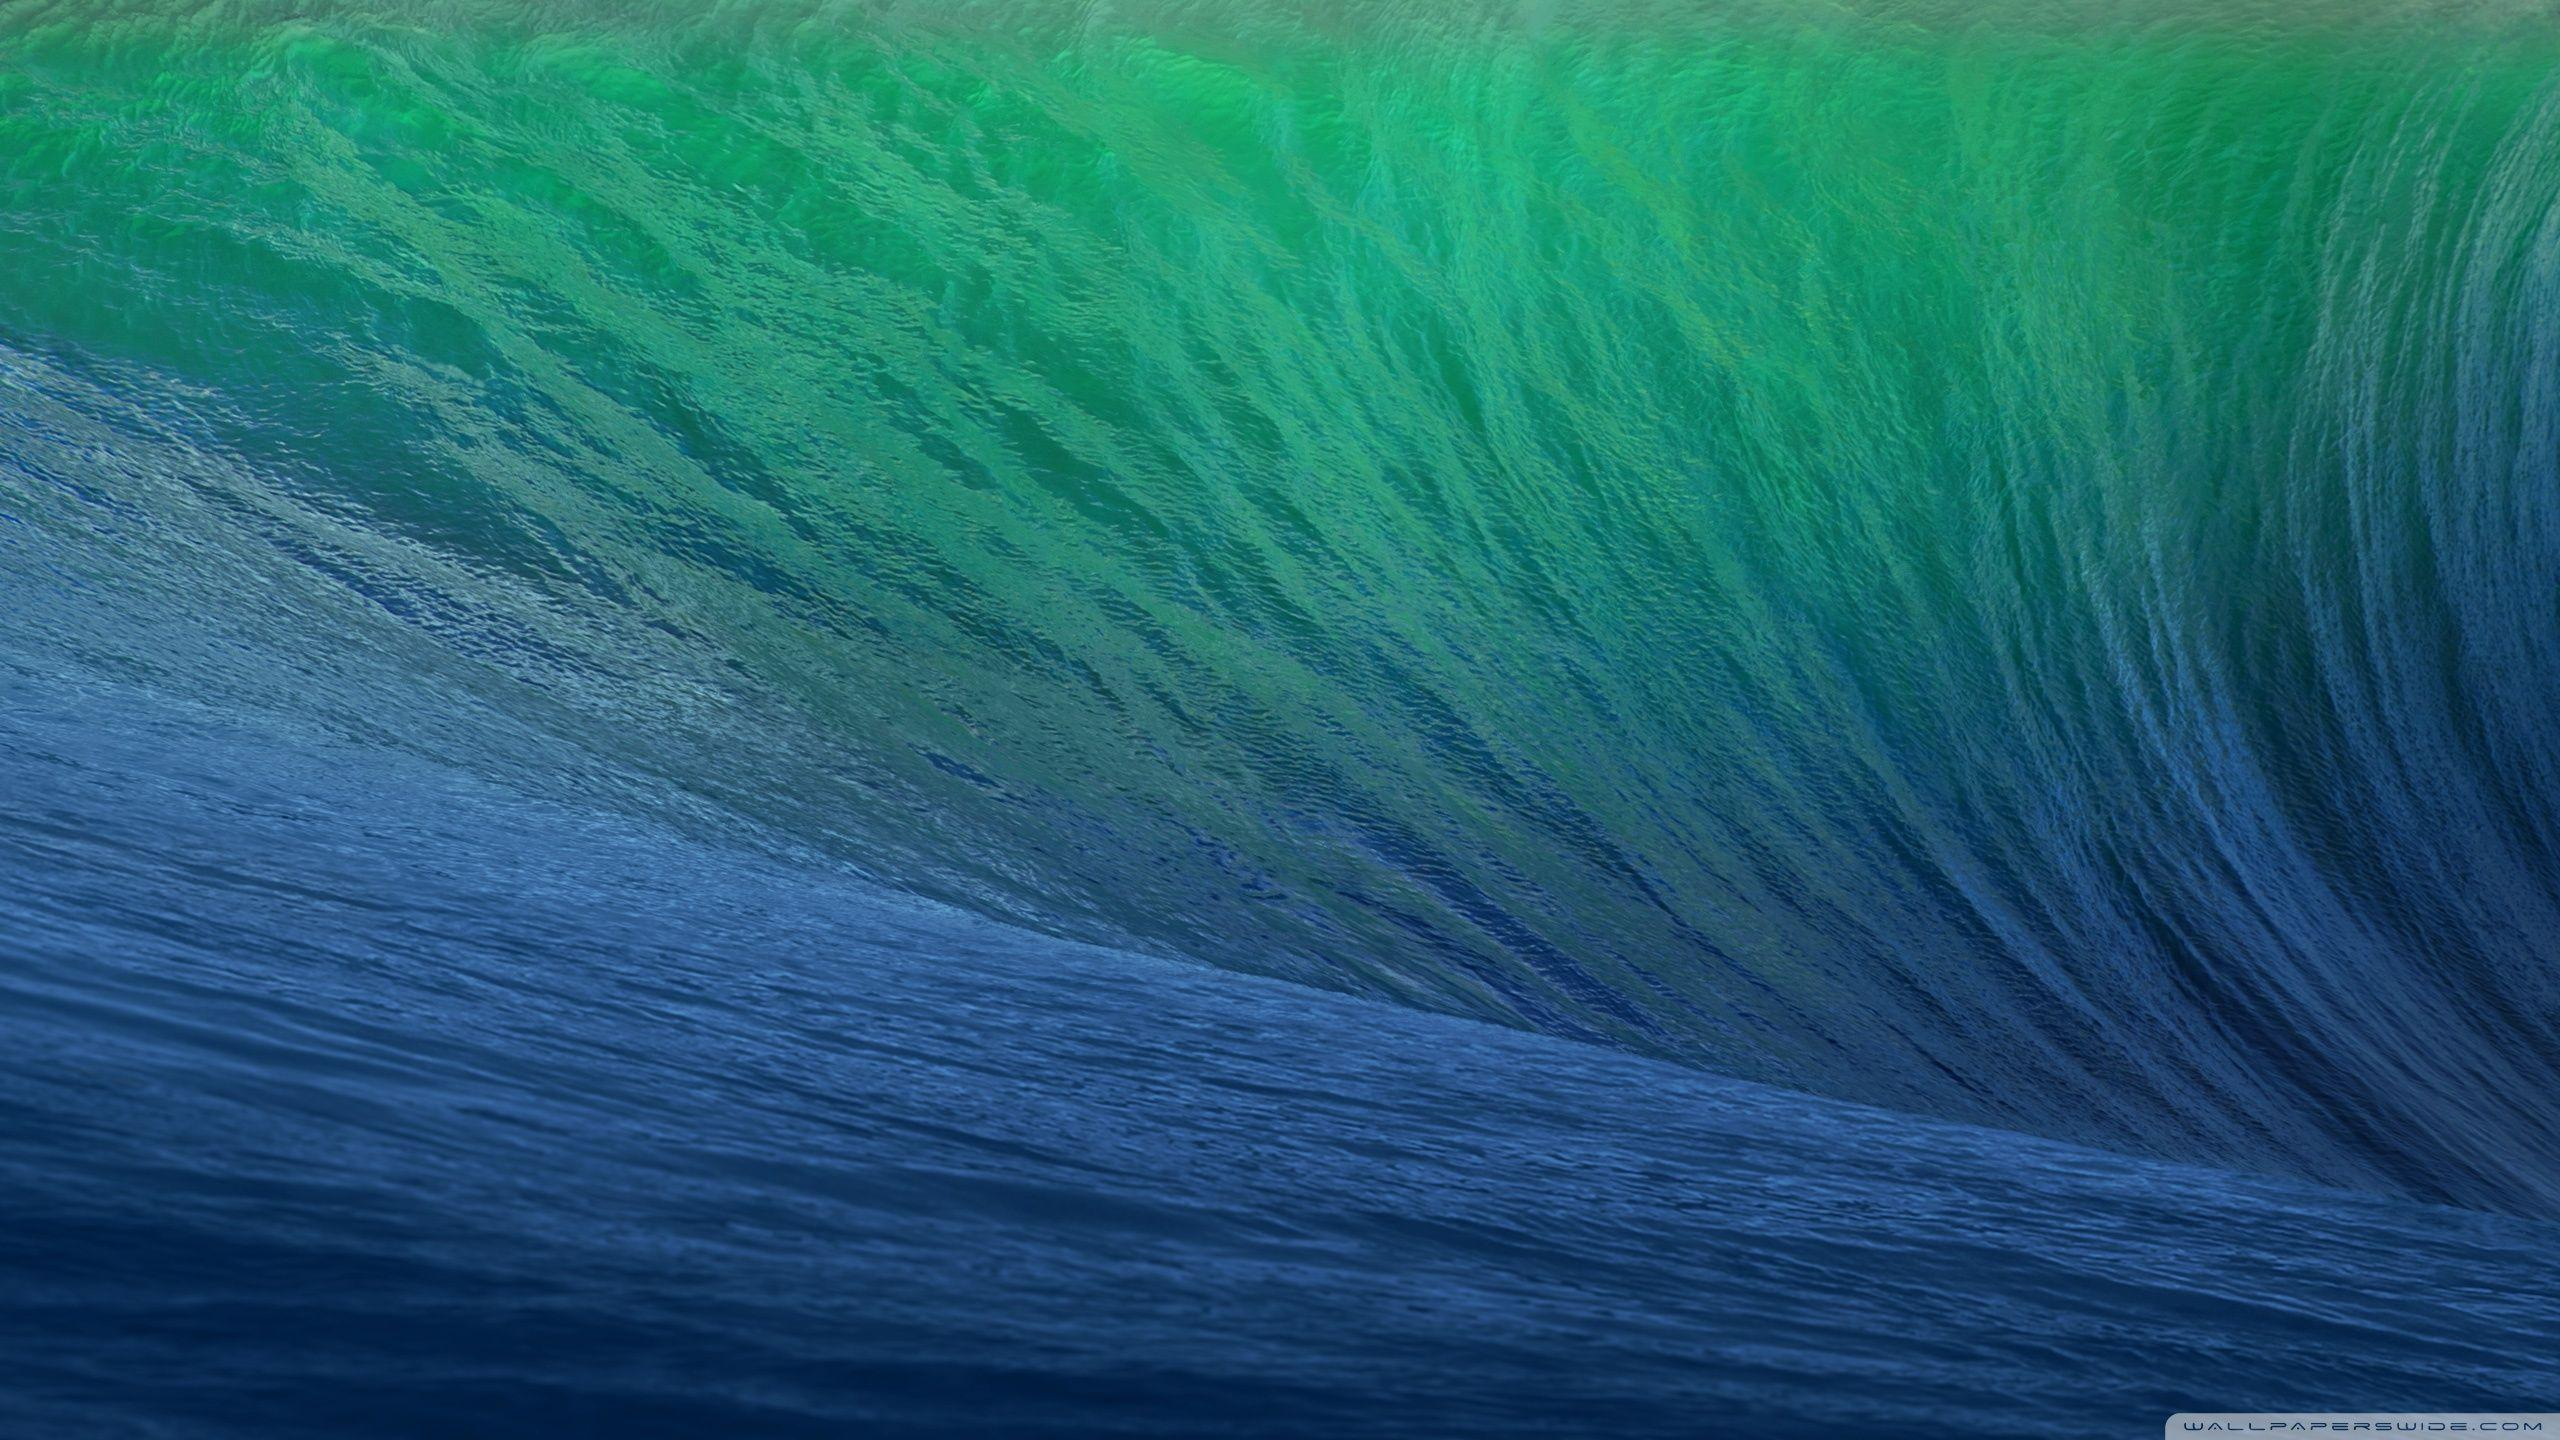 Hd Wallpaper For Mac Desktop